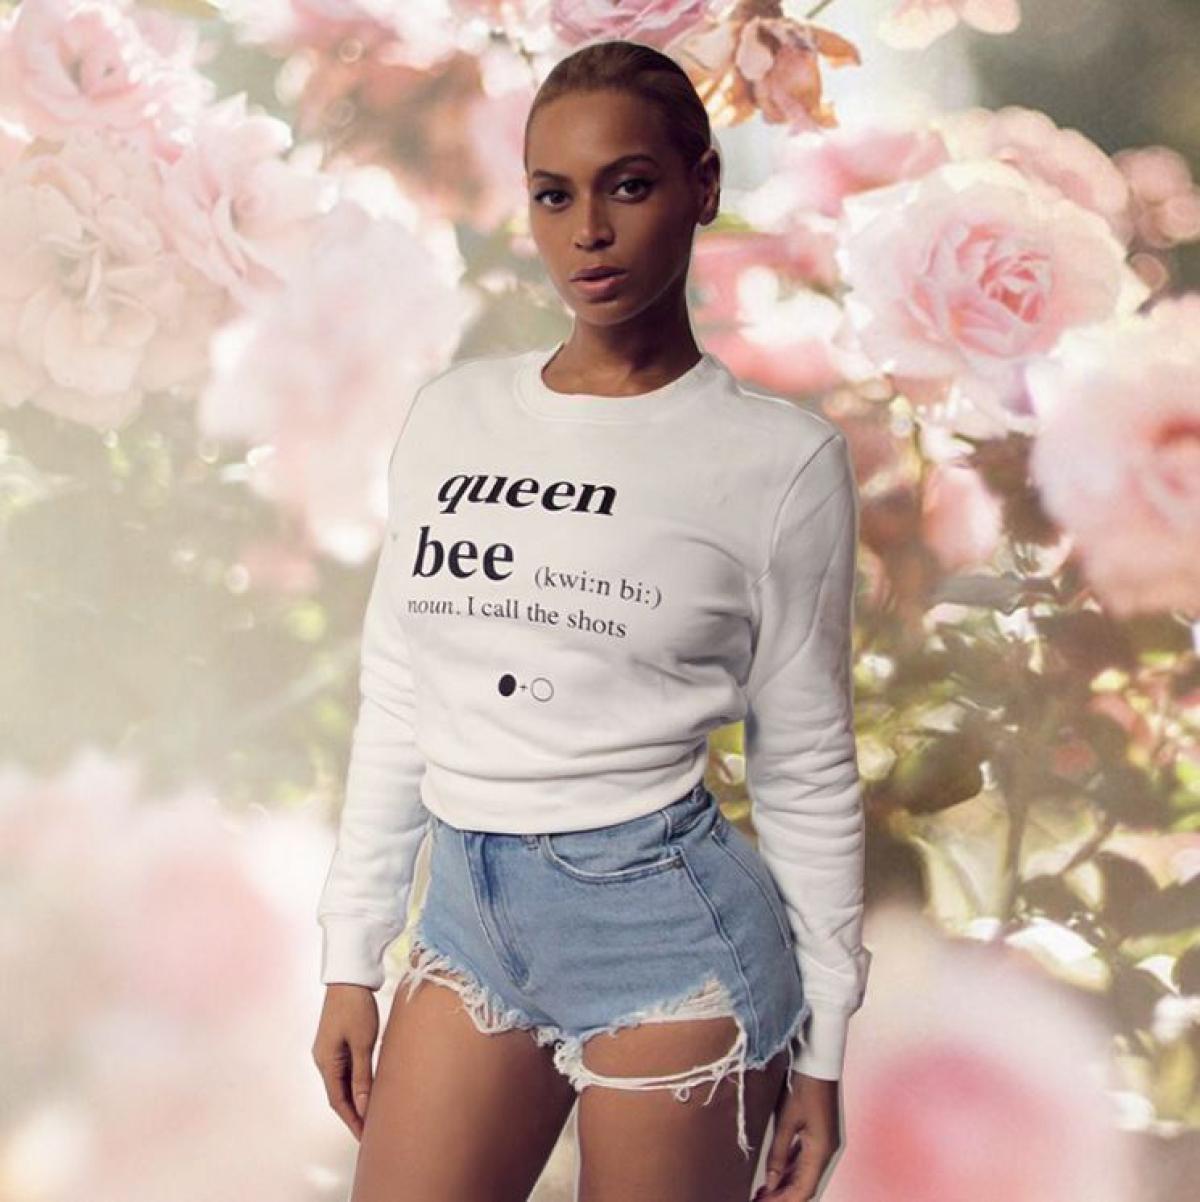 beyonce-queen-bee-sweatshirt-baw-london